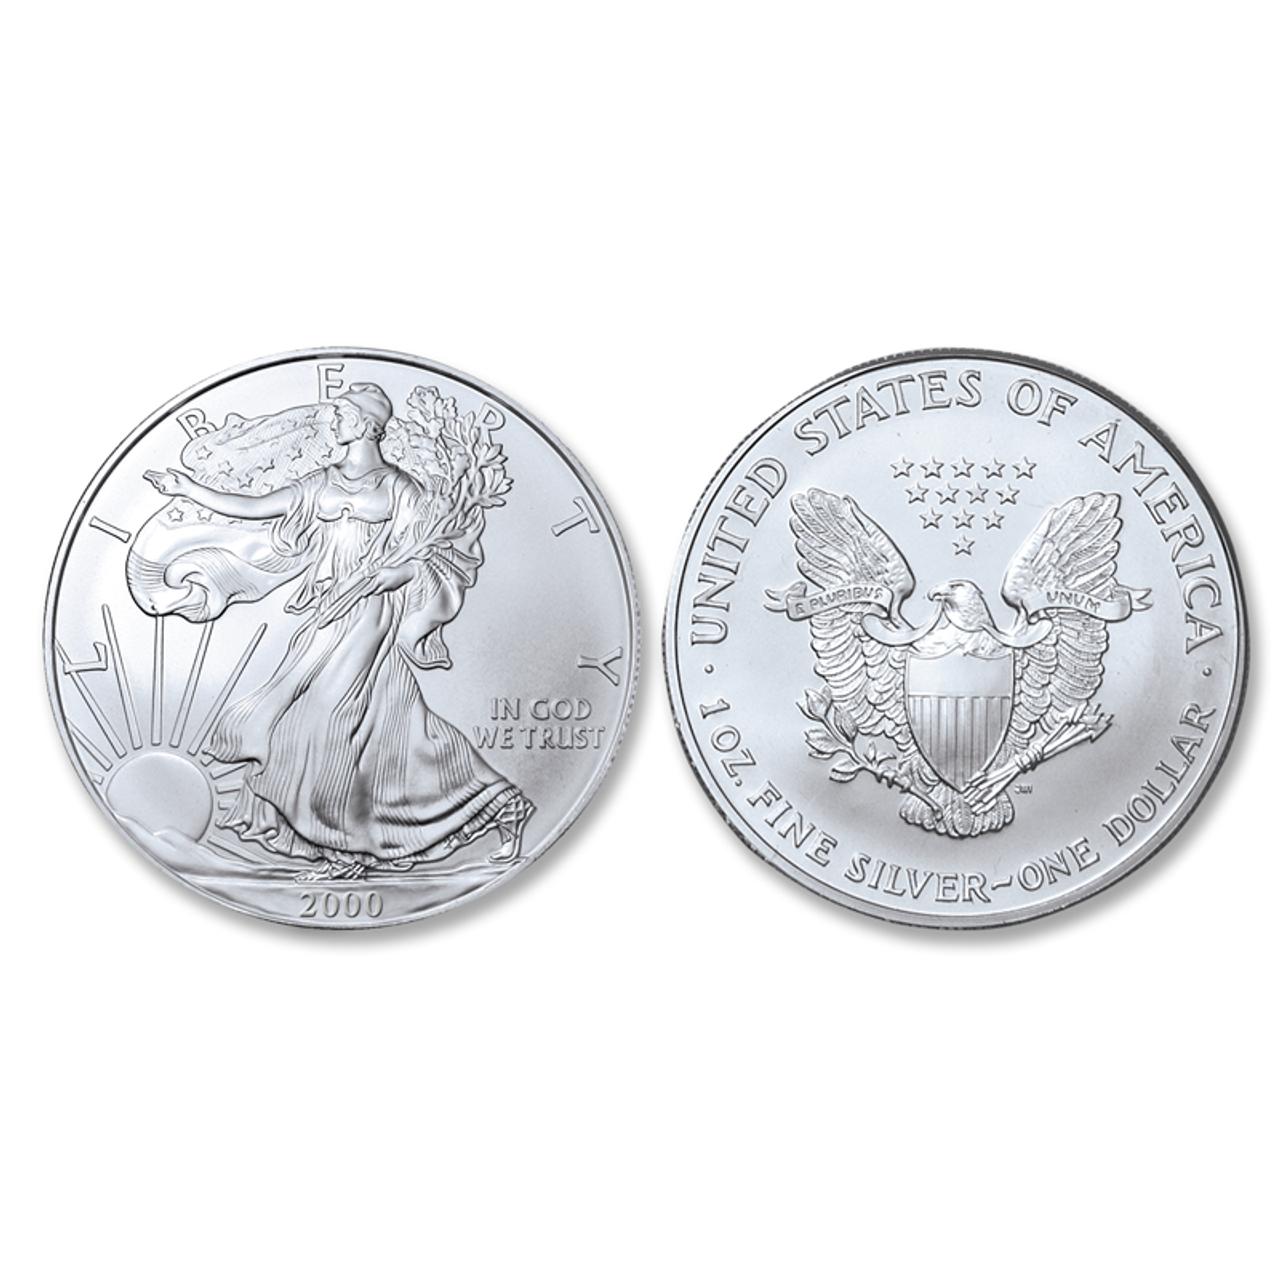 2000 Brilliant Uncirculated Silver Eagle Dollar